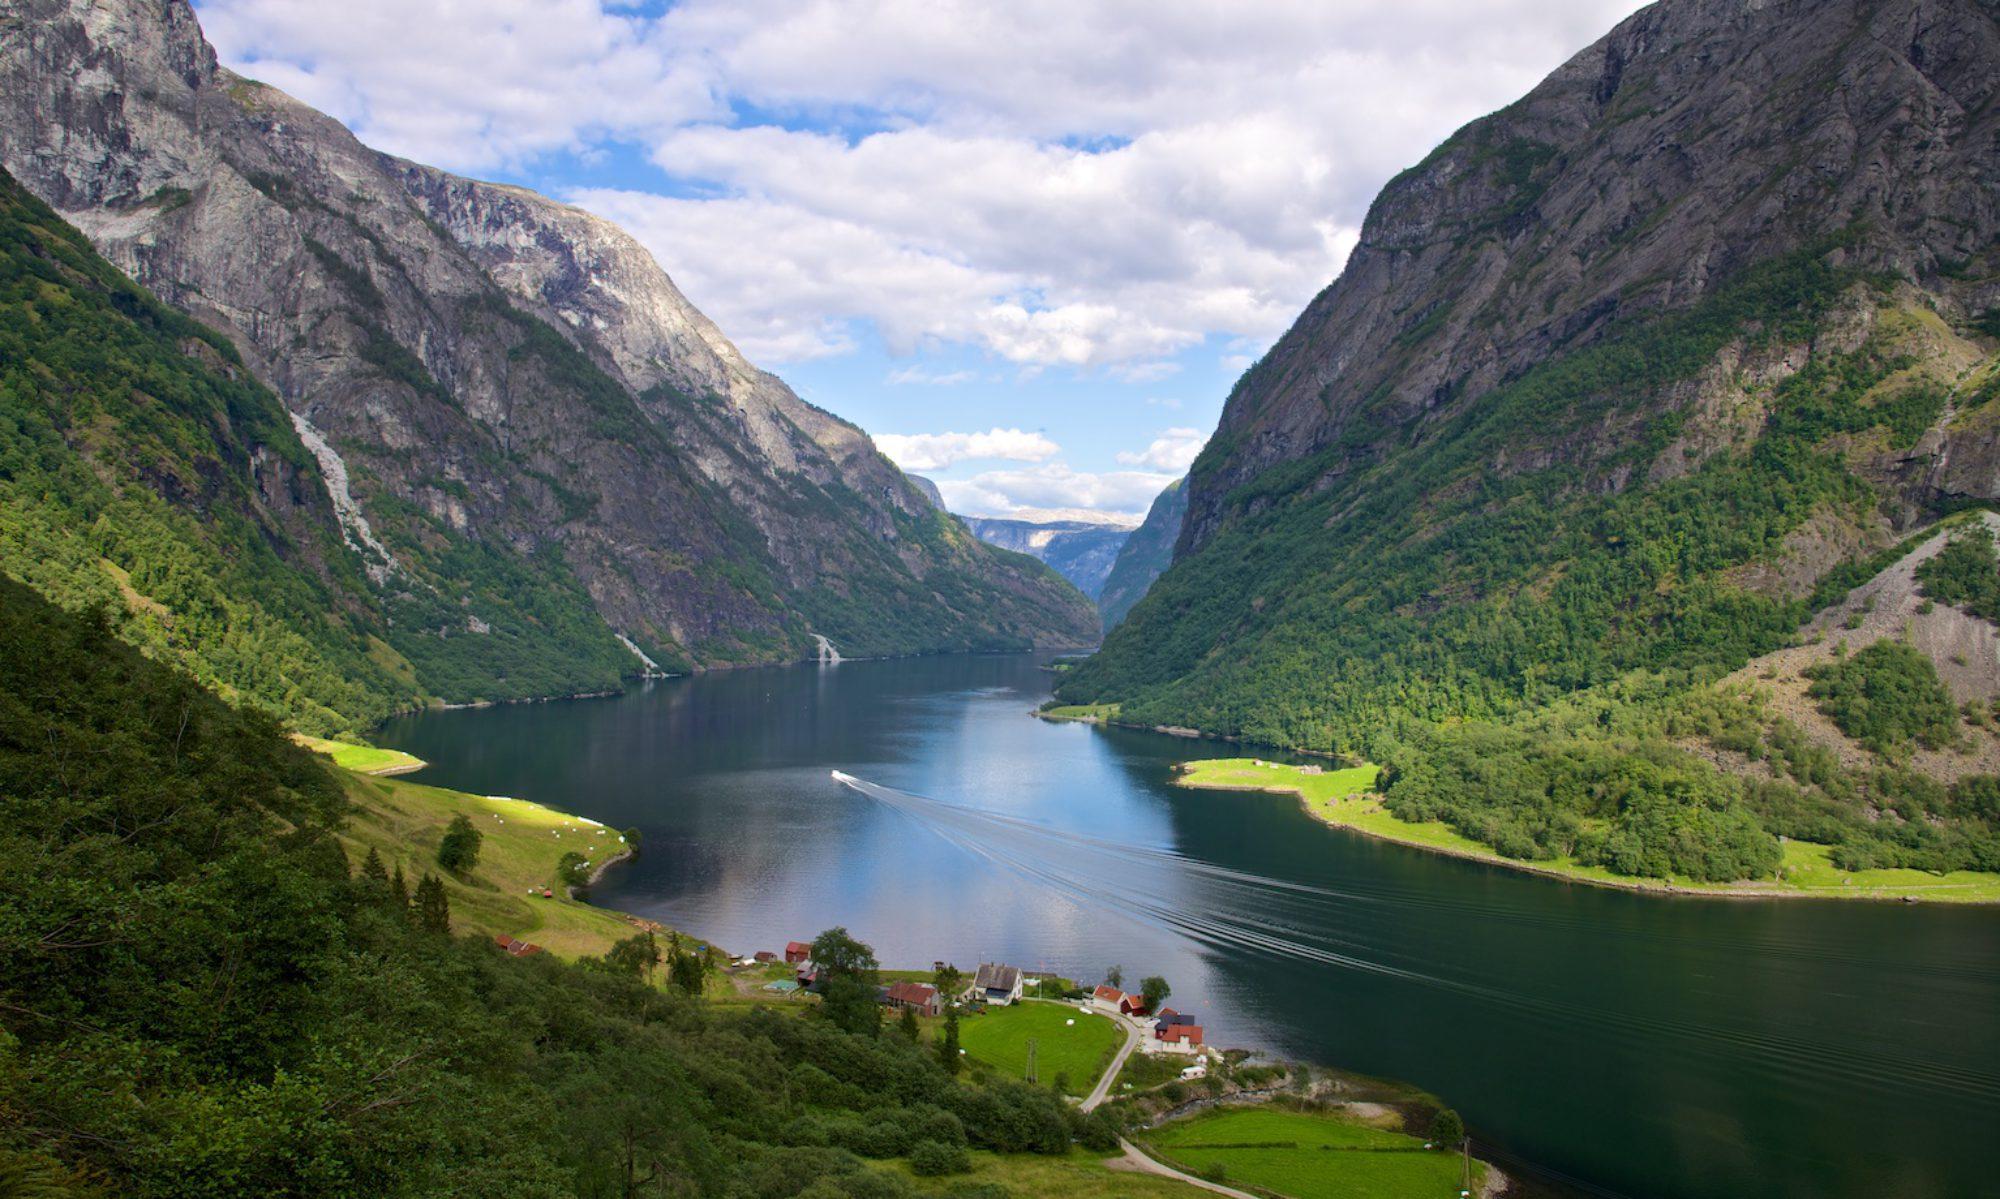 The Nærøyfjord in Sogn